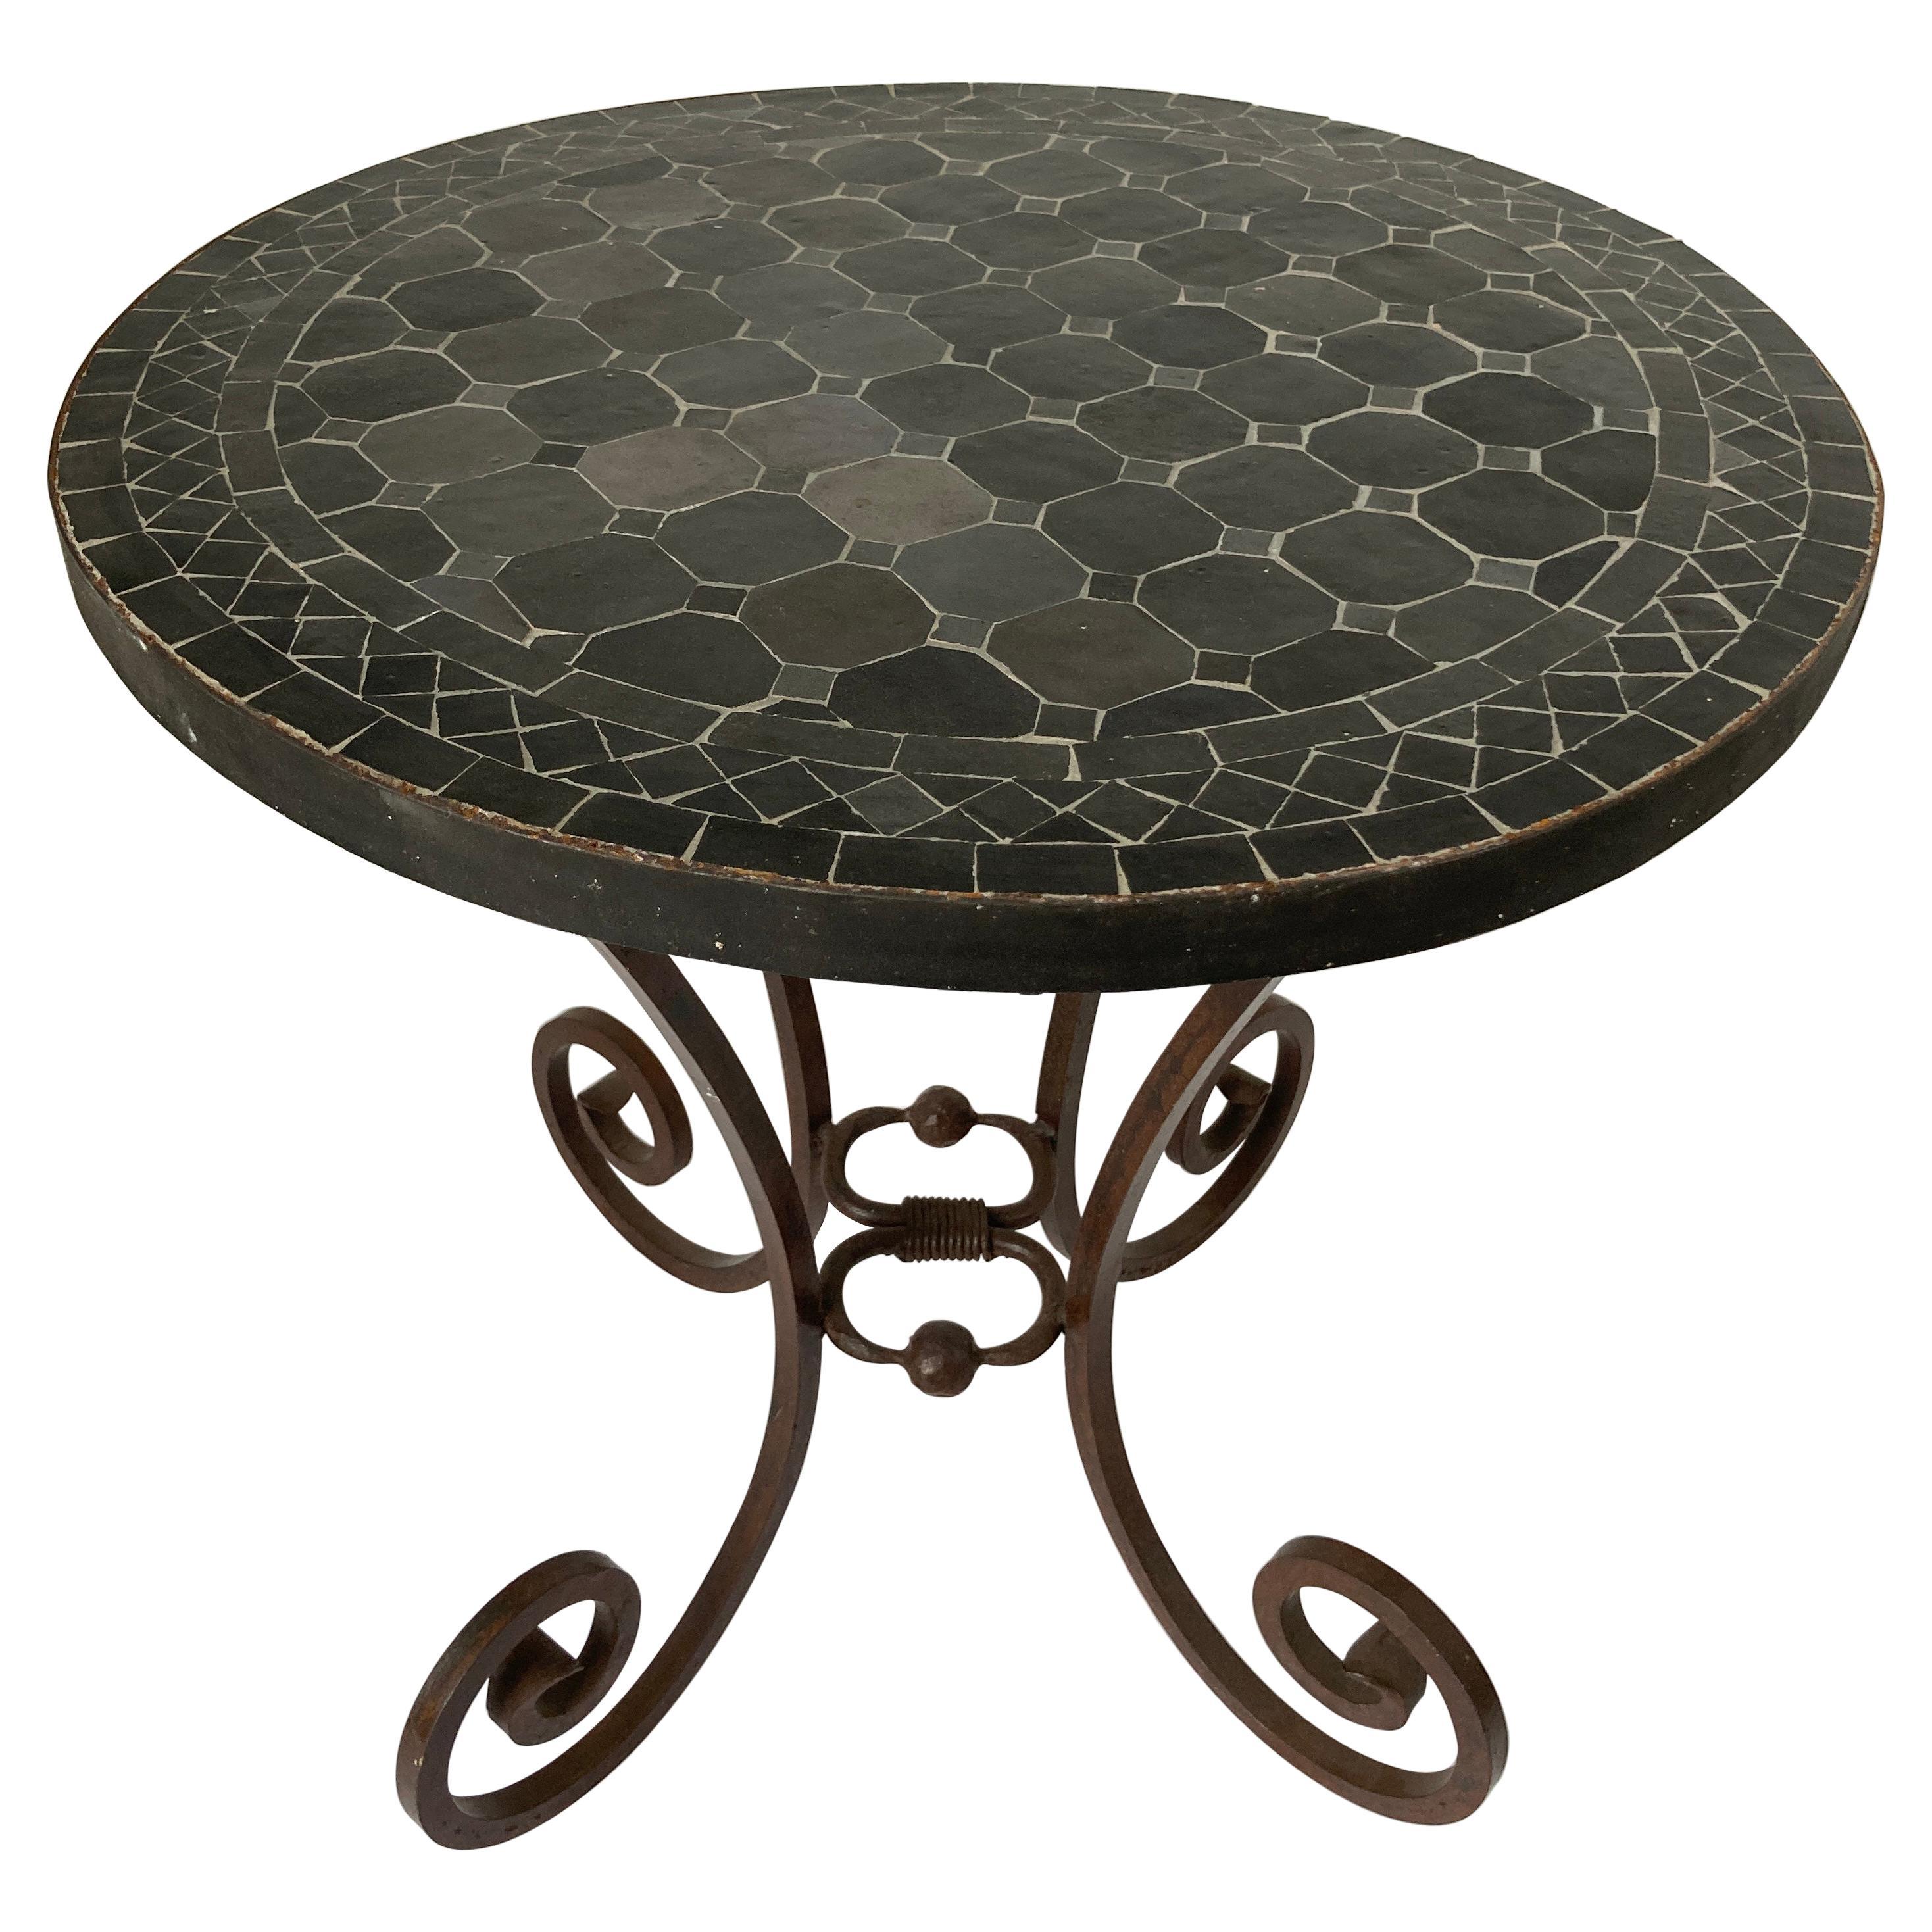 Moroccan Mosaic Black Tile Color Side Patio Table